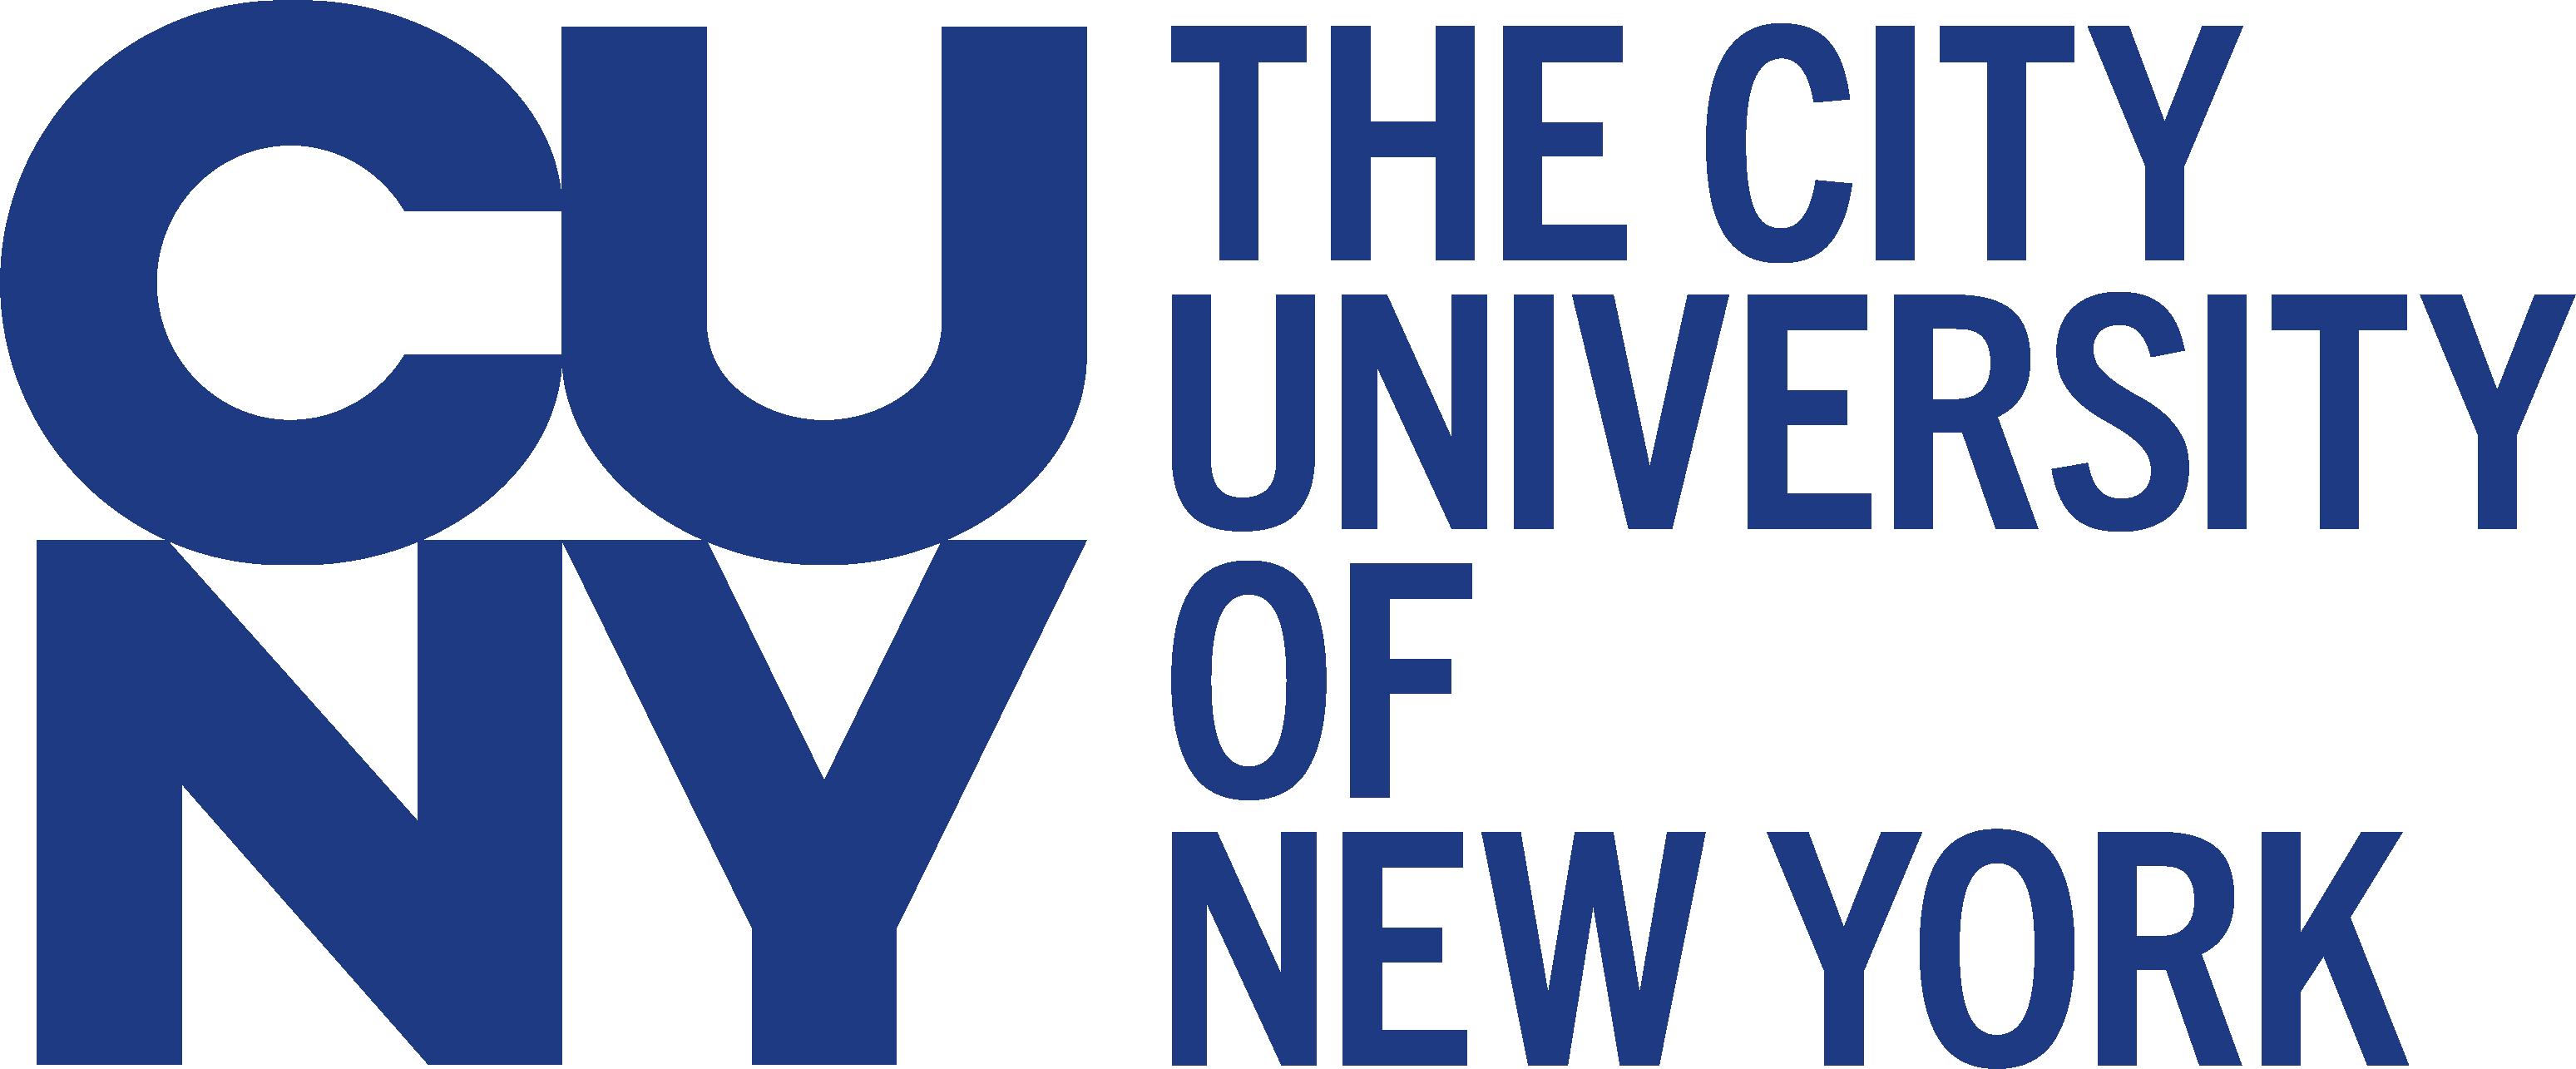 John Jay and CUNY Logos | John Jay College of Criminal Justice